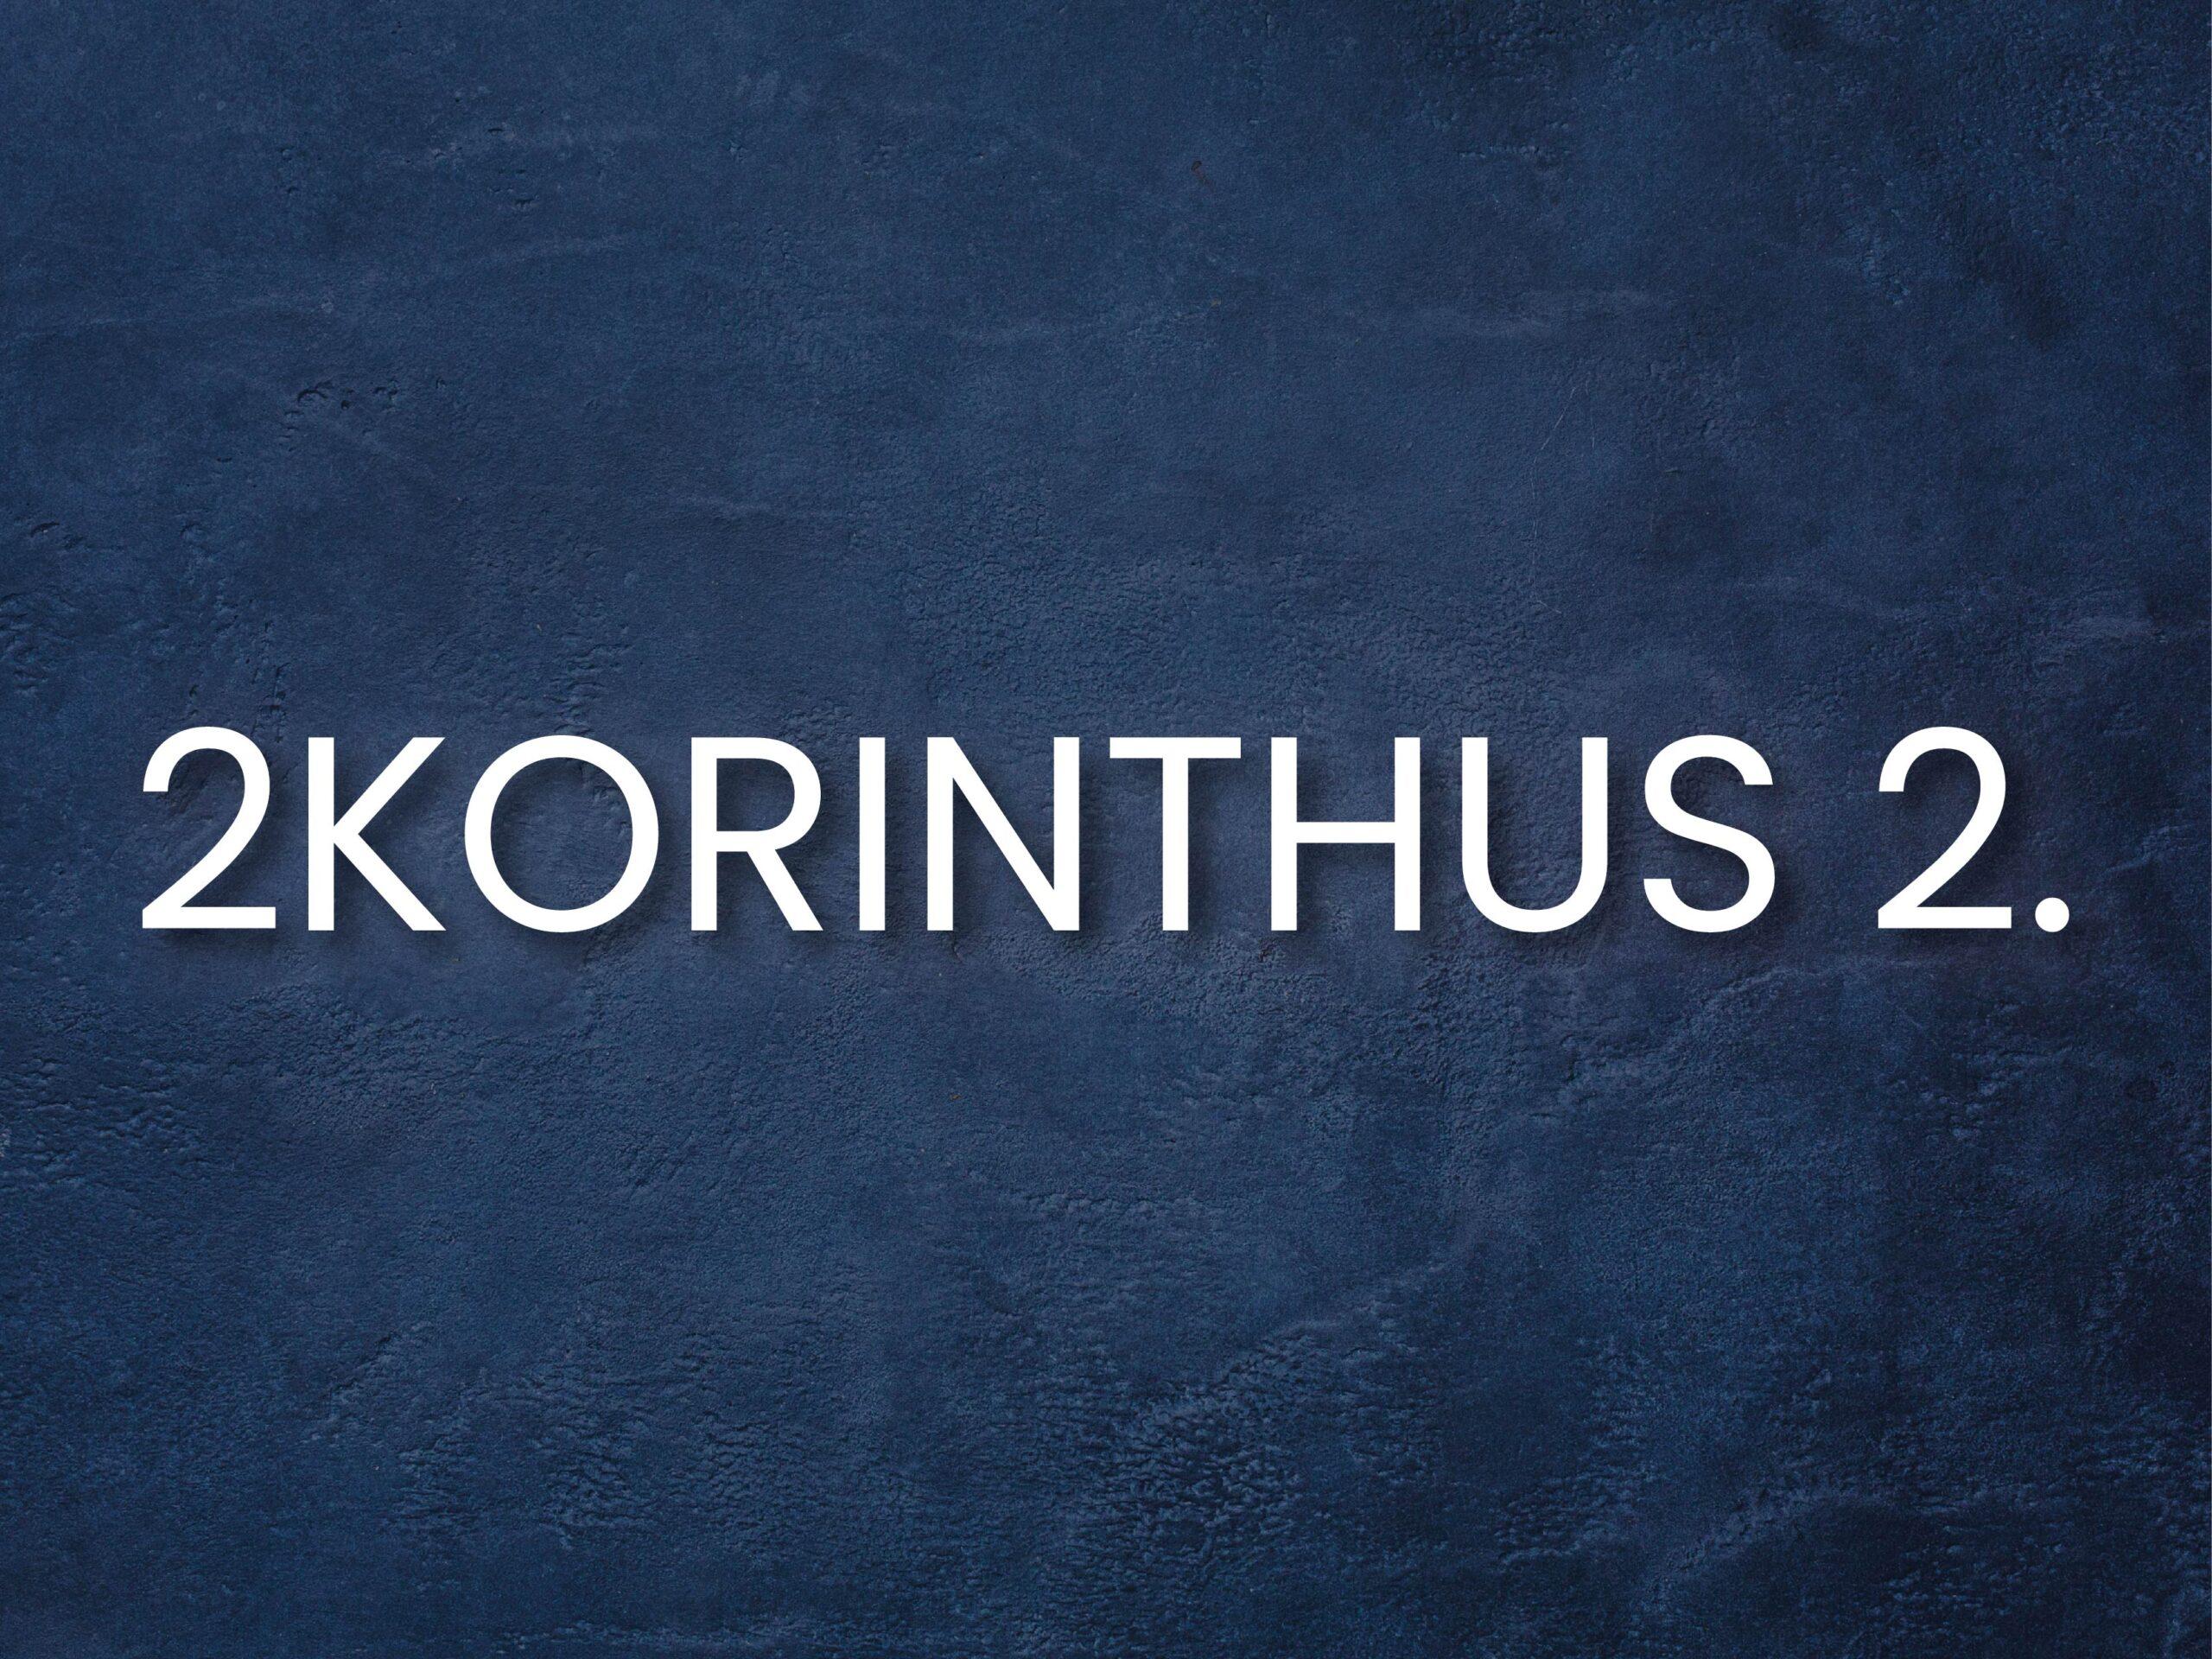 INFO_2korinthus_2